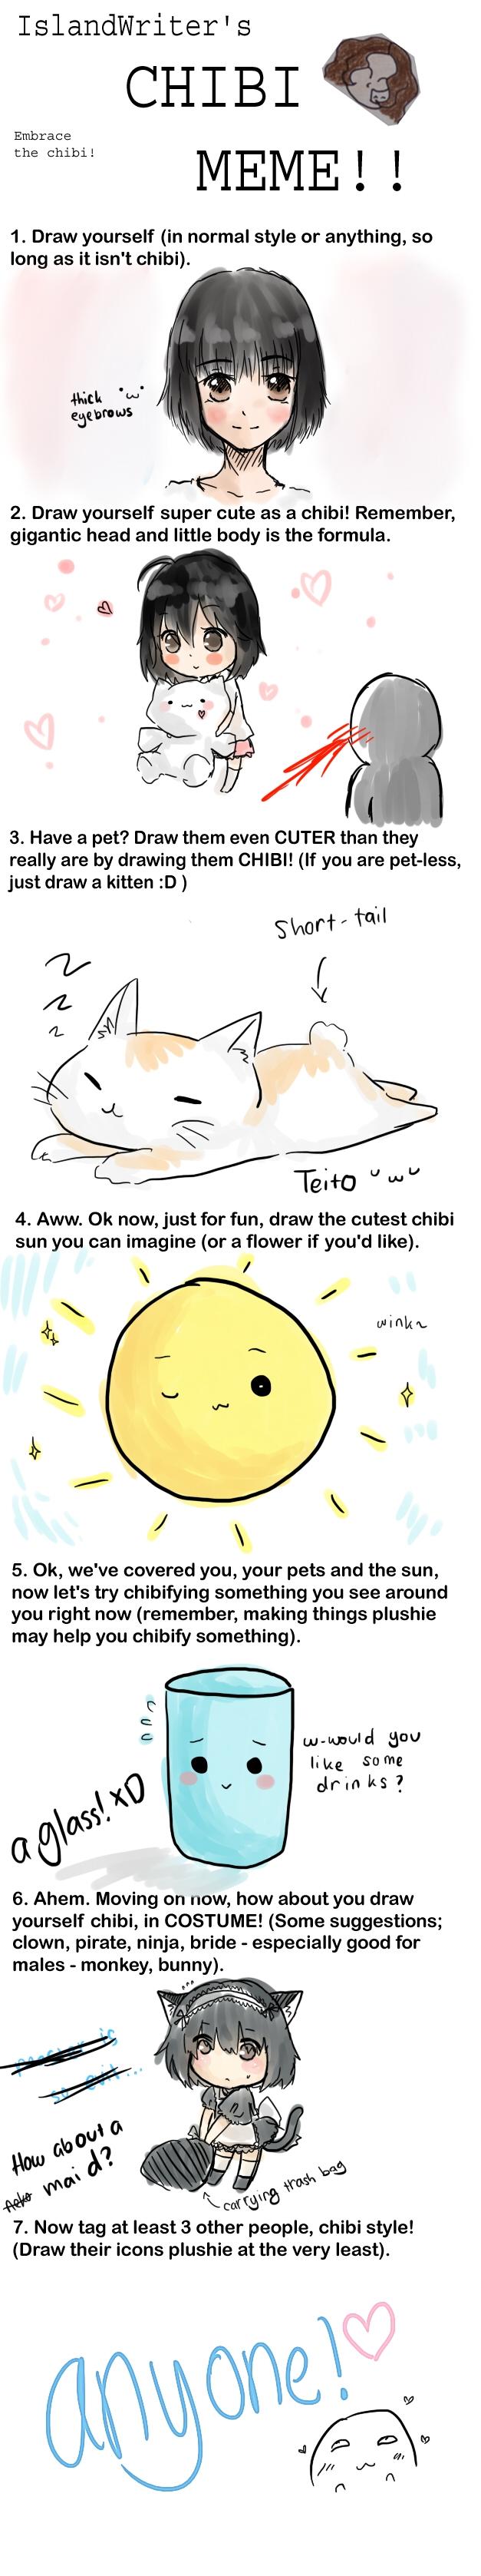 Cuteness overload meme tumblr too cute p by akira